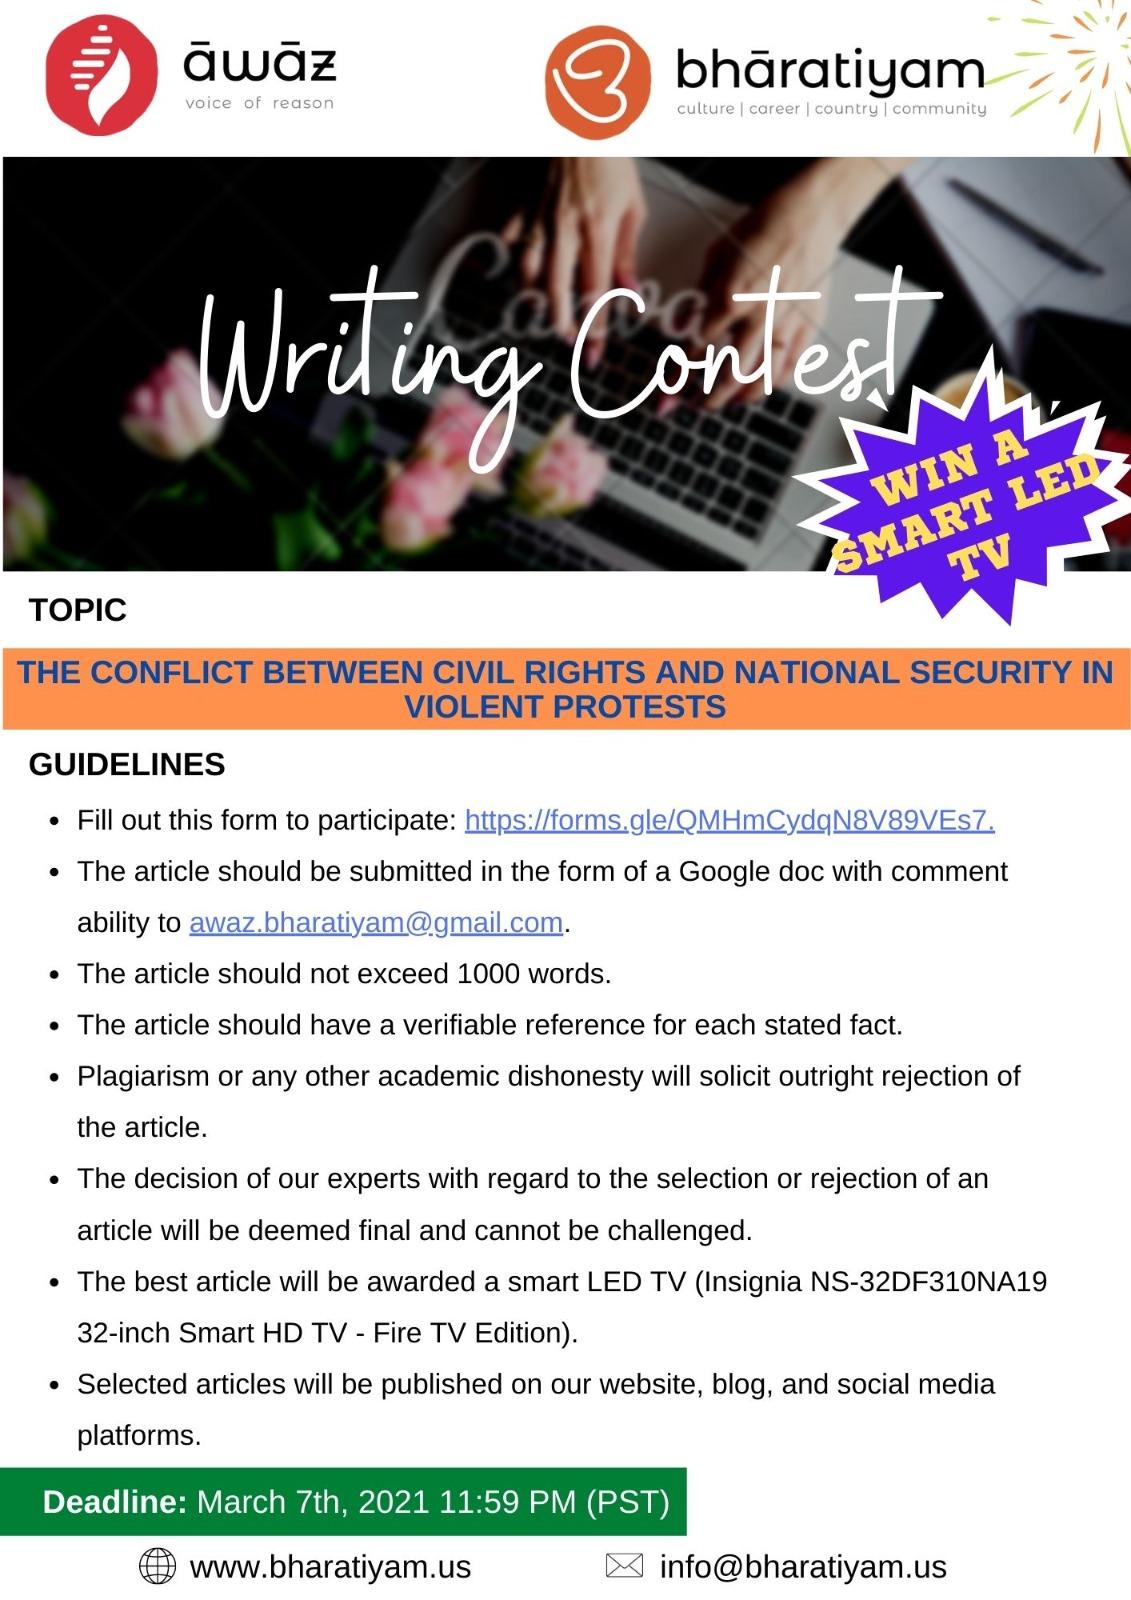 Bharaityam-Writing-Contest-March-7-2021